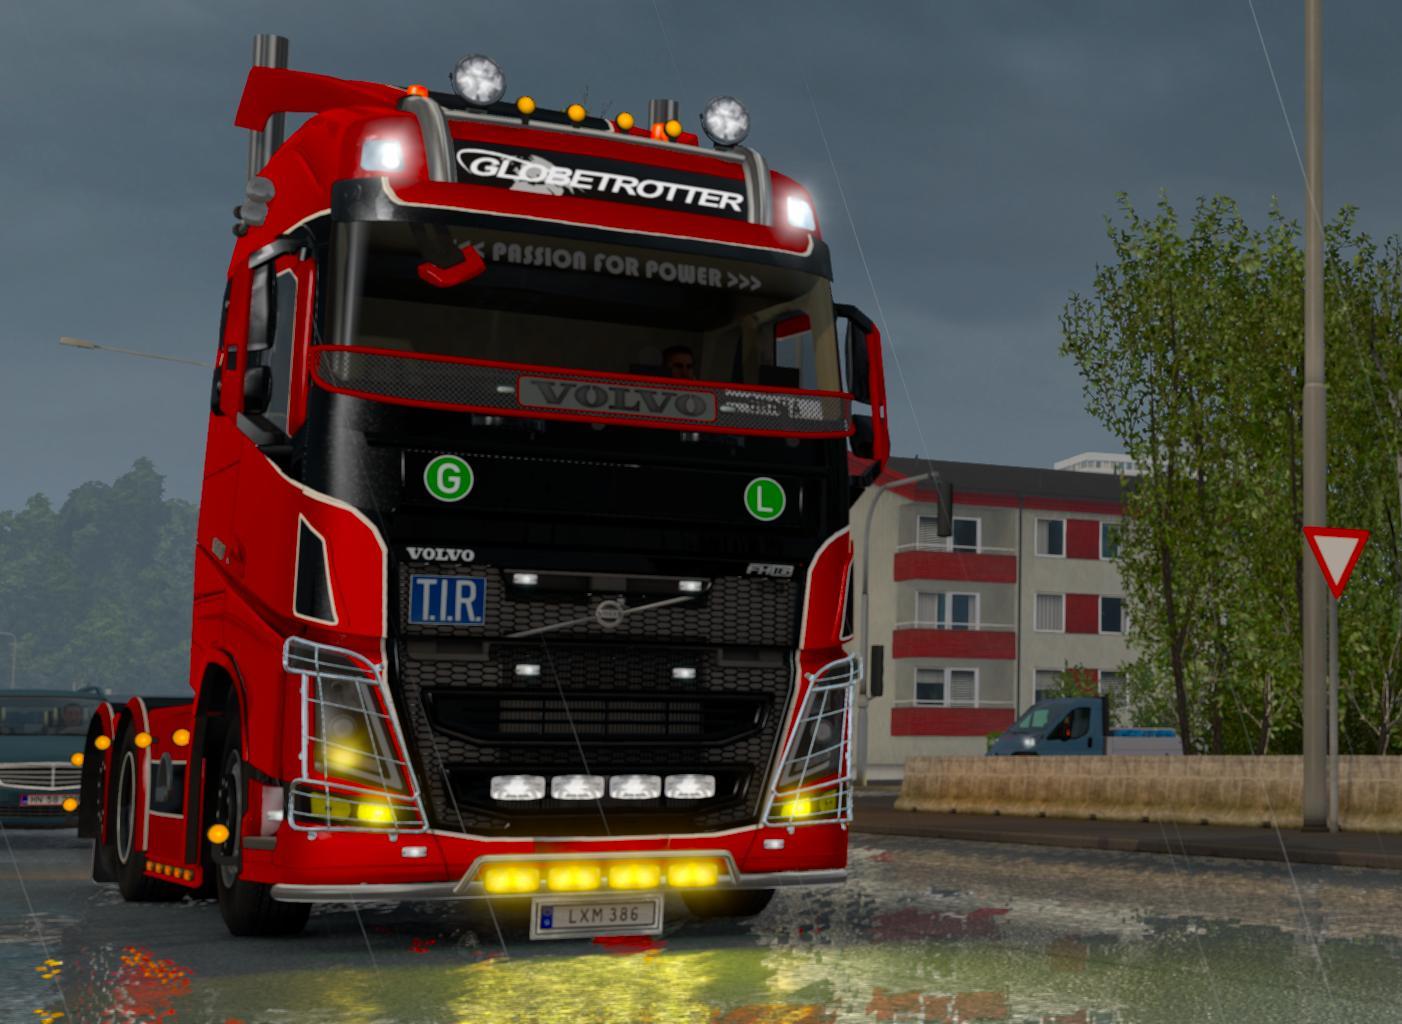 Daf xf tuning mod ets2 euro truck simulator 2 youtube - New Light For Scania Euro Truck Simulator 2 Mod Car Tuning